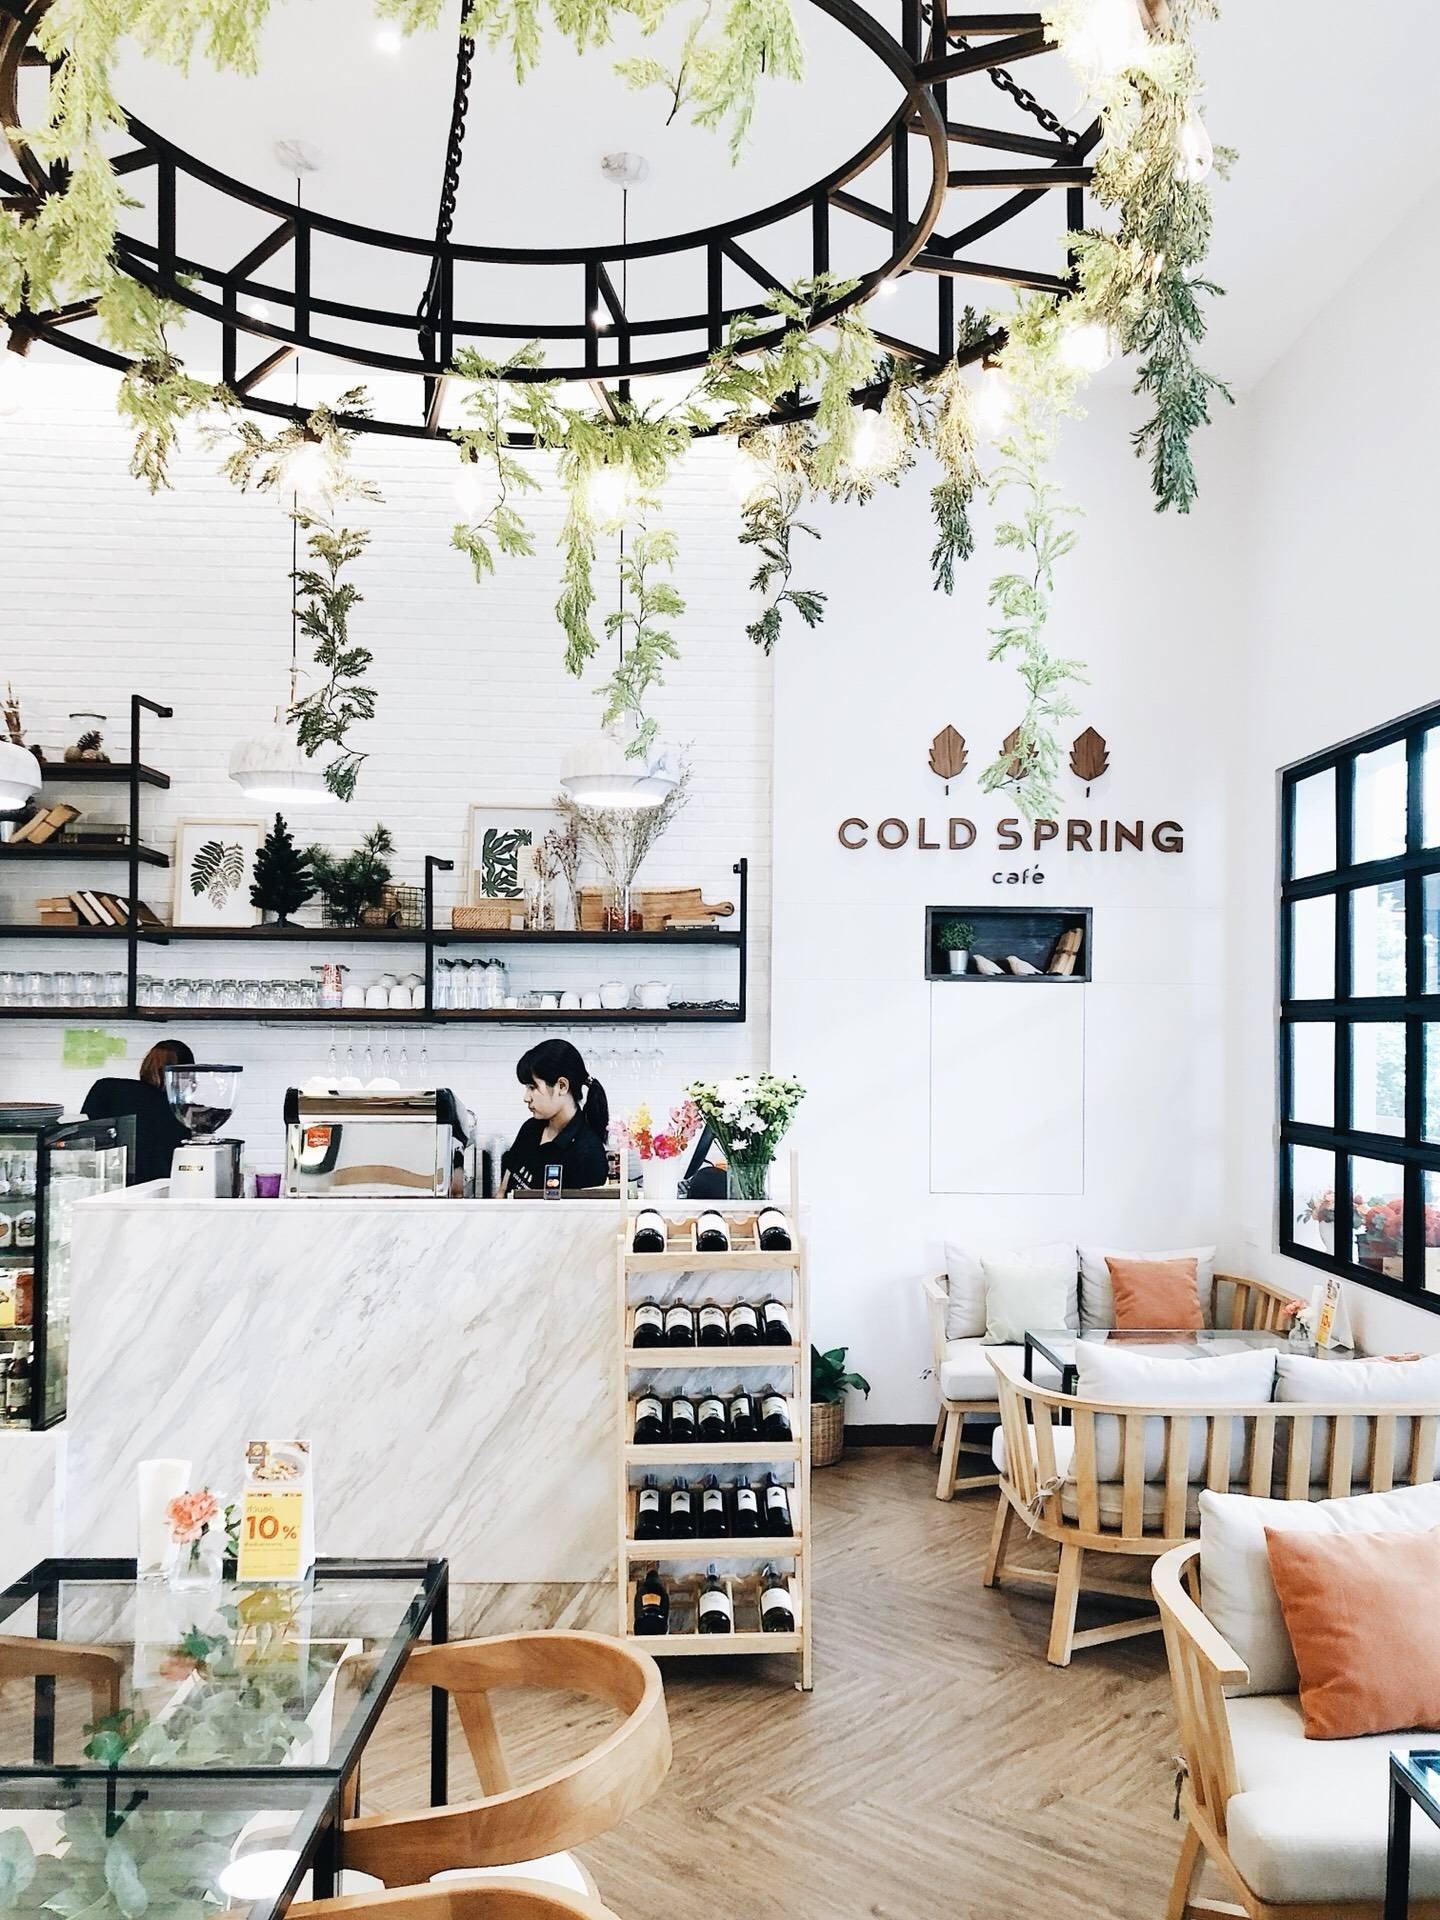 Cold Spring Café อินท์ อินเตอร์เซค พระราม 3